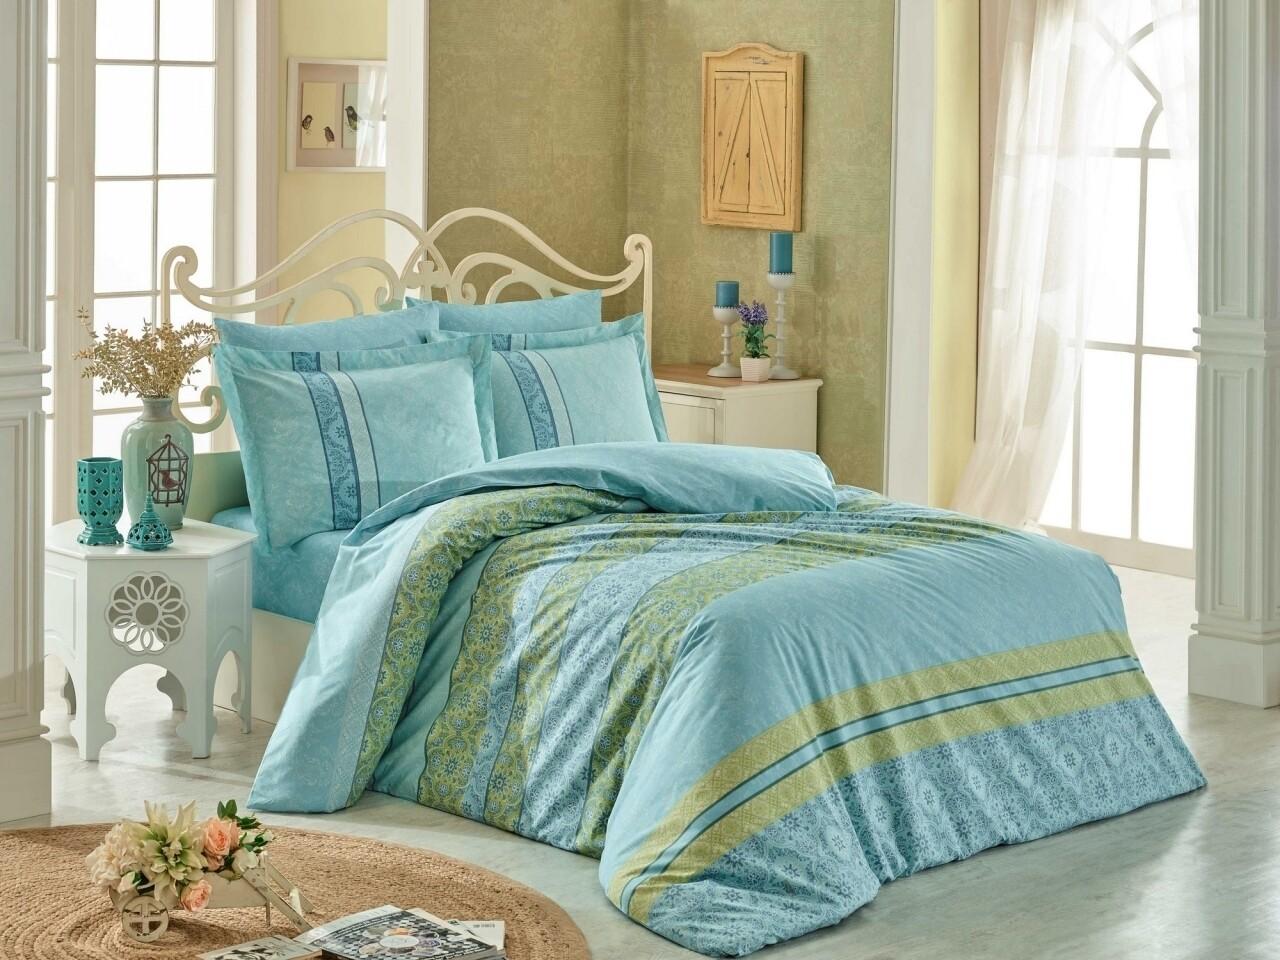 Lenjerie de pat pentru o persoana, 3 piese, 100% bumbac poplin, Hobby, Emma, turcoaz